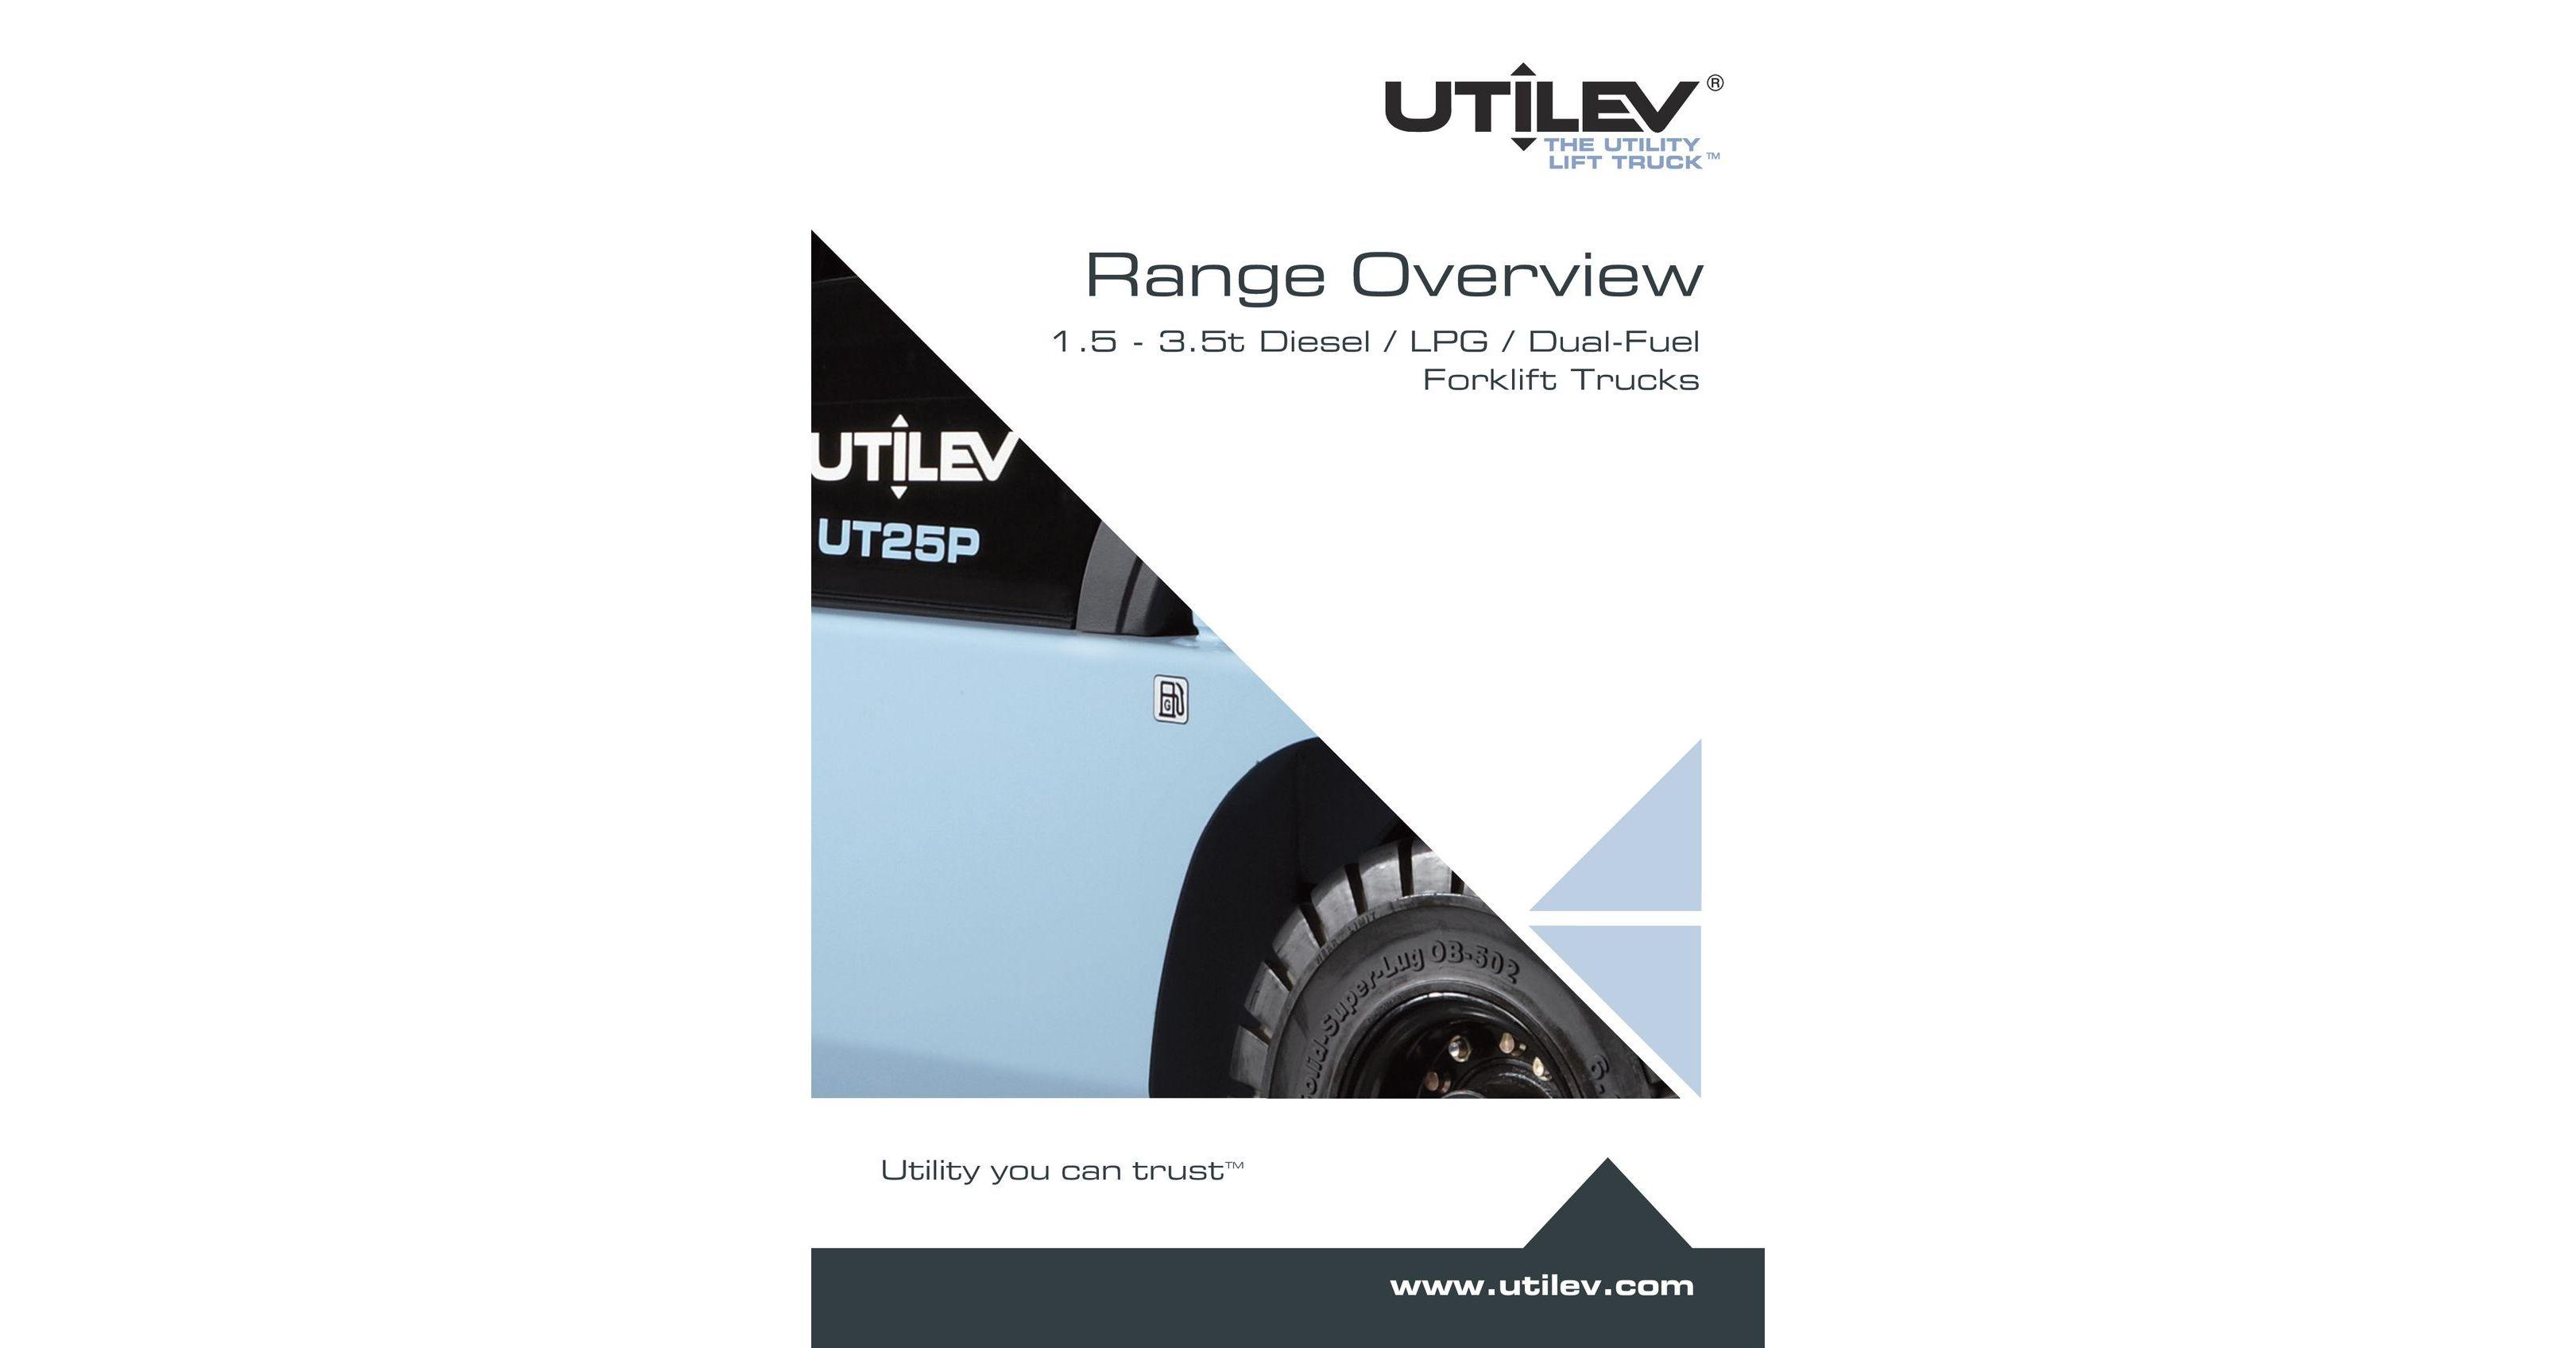 Range Overview 1 5 3 5t Diesel Lpg Dual Fuel Forklift Trucks